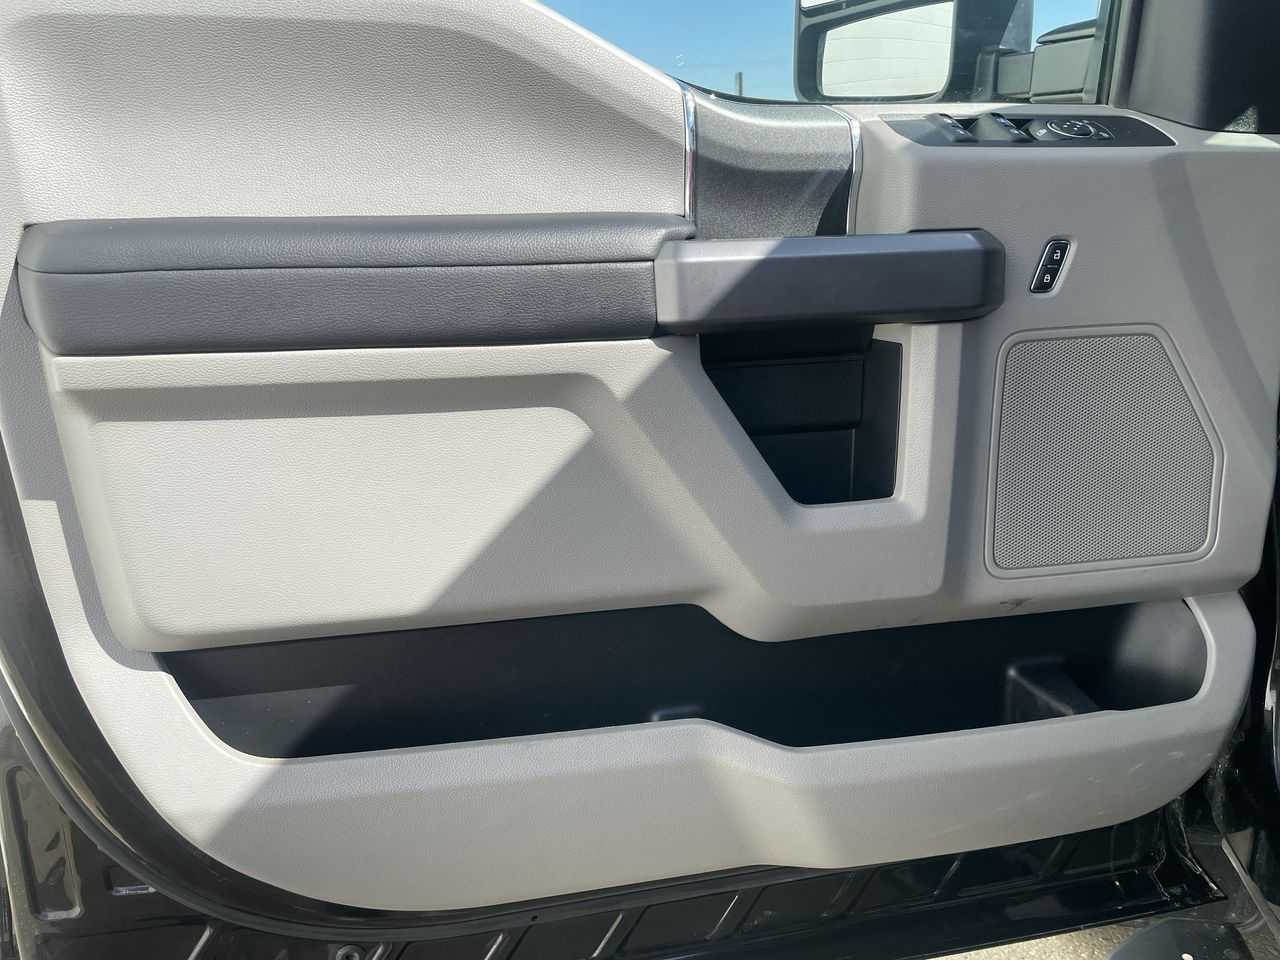 2020 Ford SUPER DUTY F-250 SRW XLT